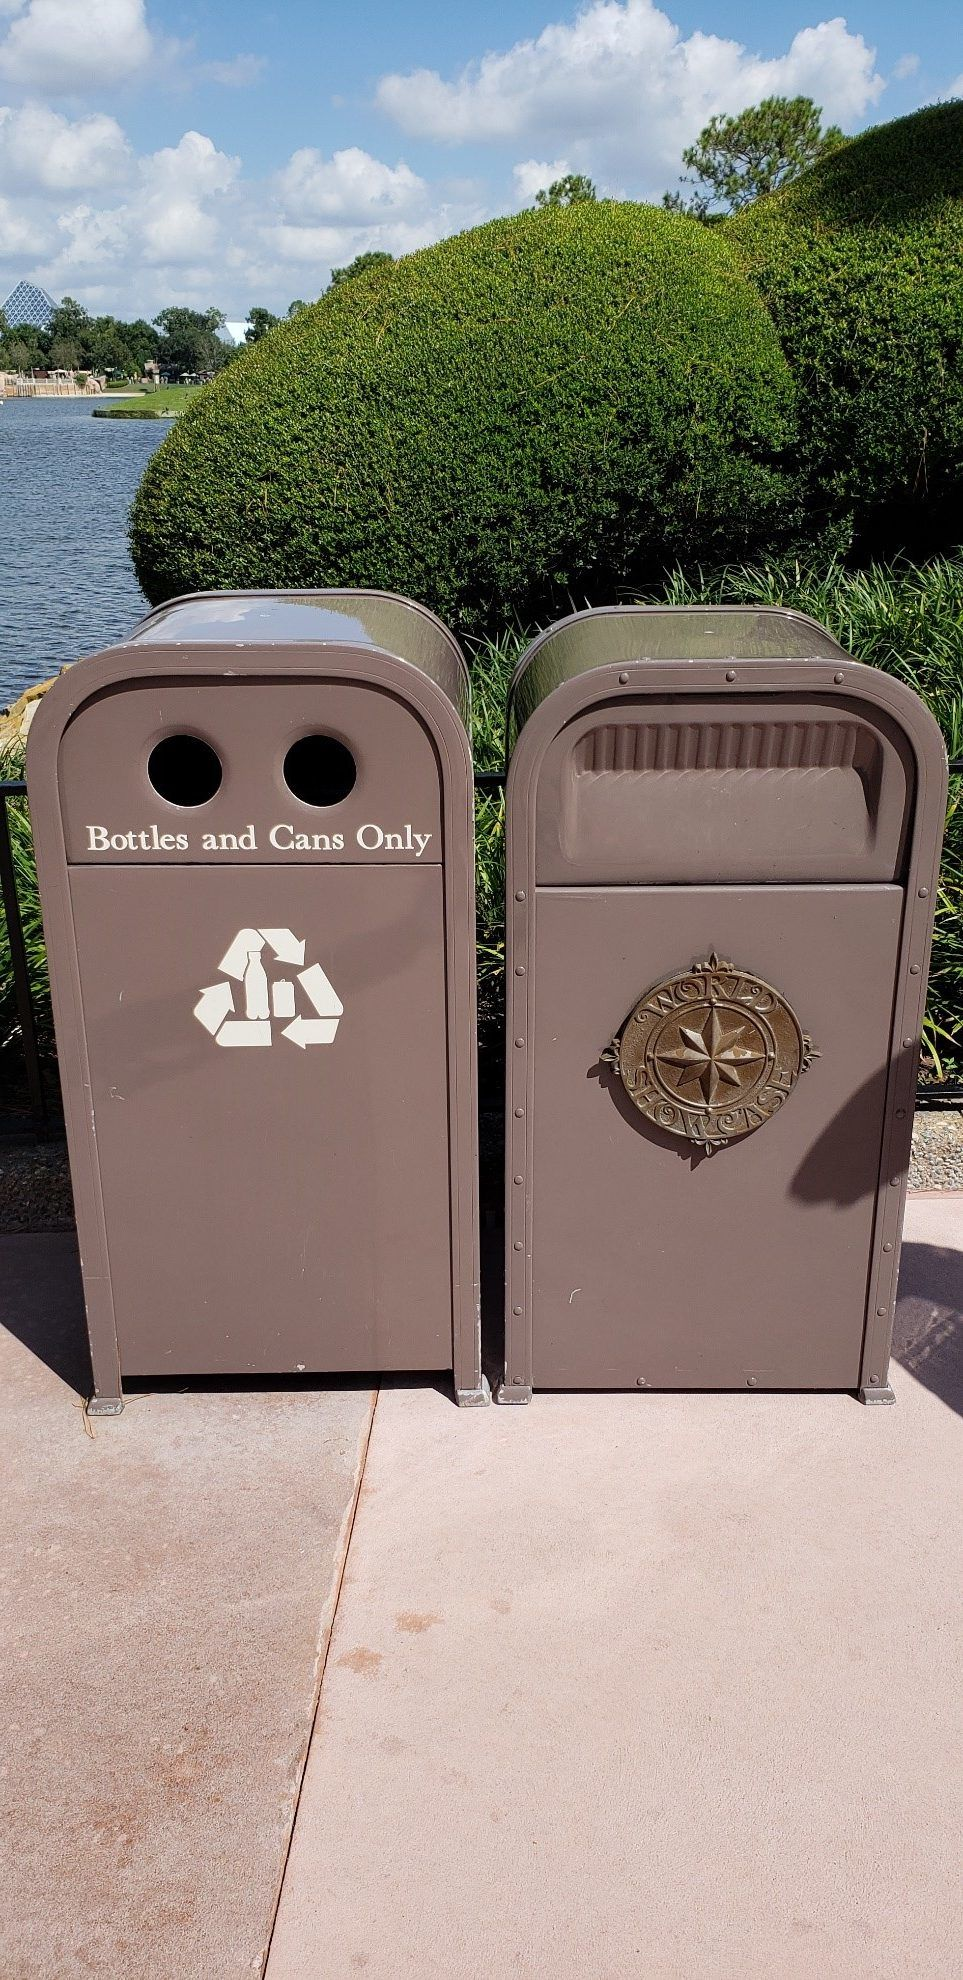 Trash Cans of Disney